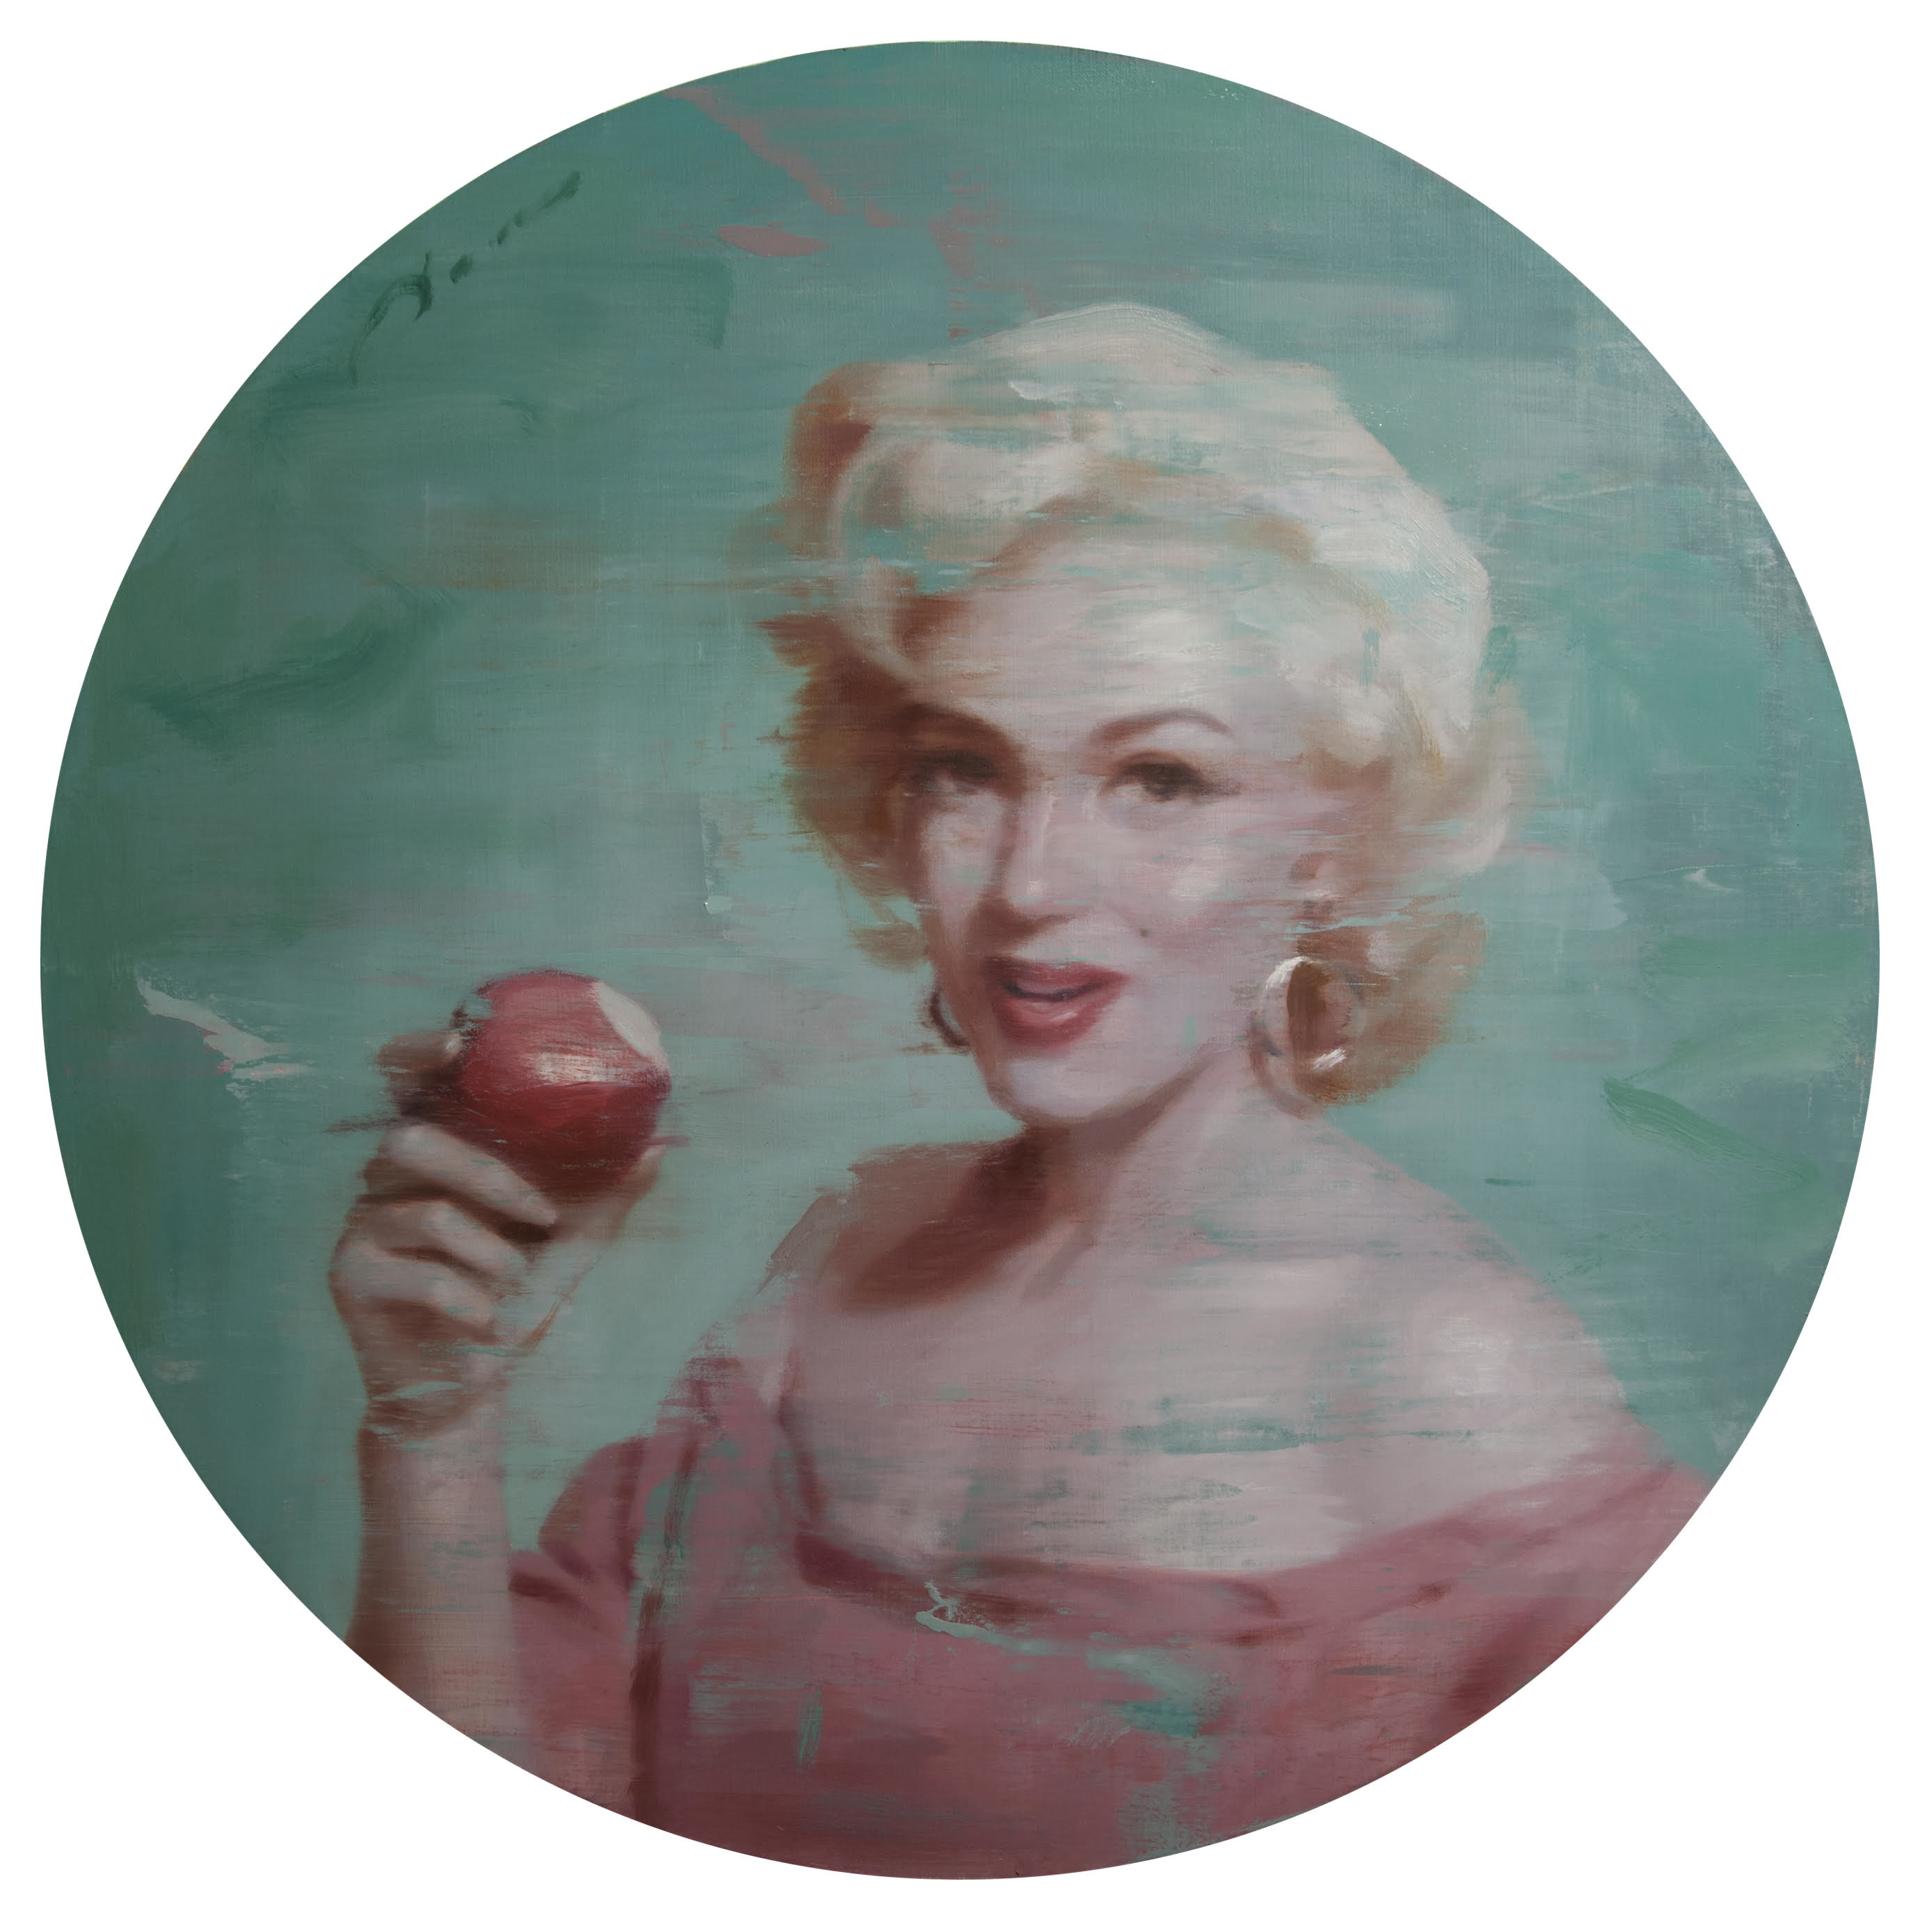 Bite the Apple by Vincent Xeus